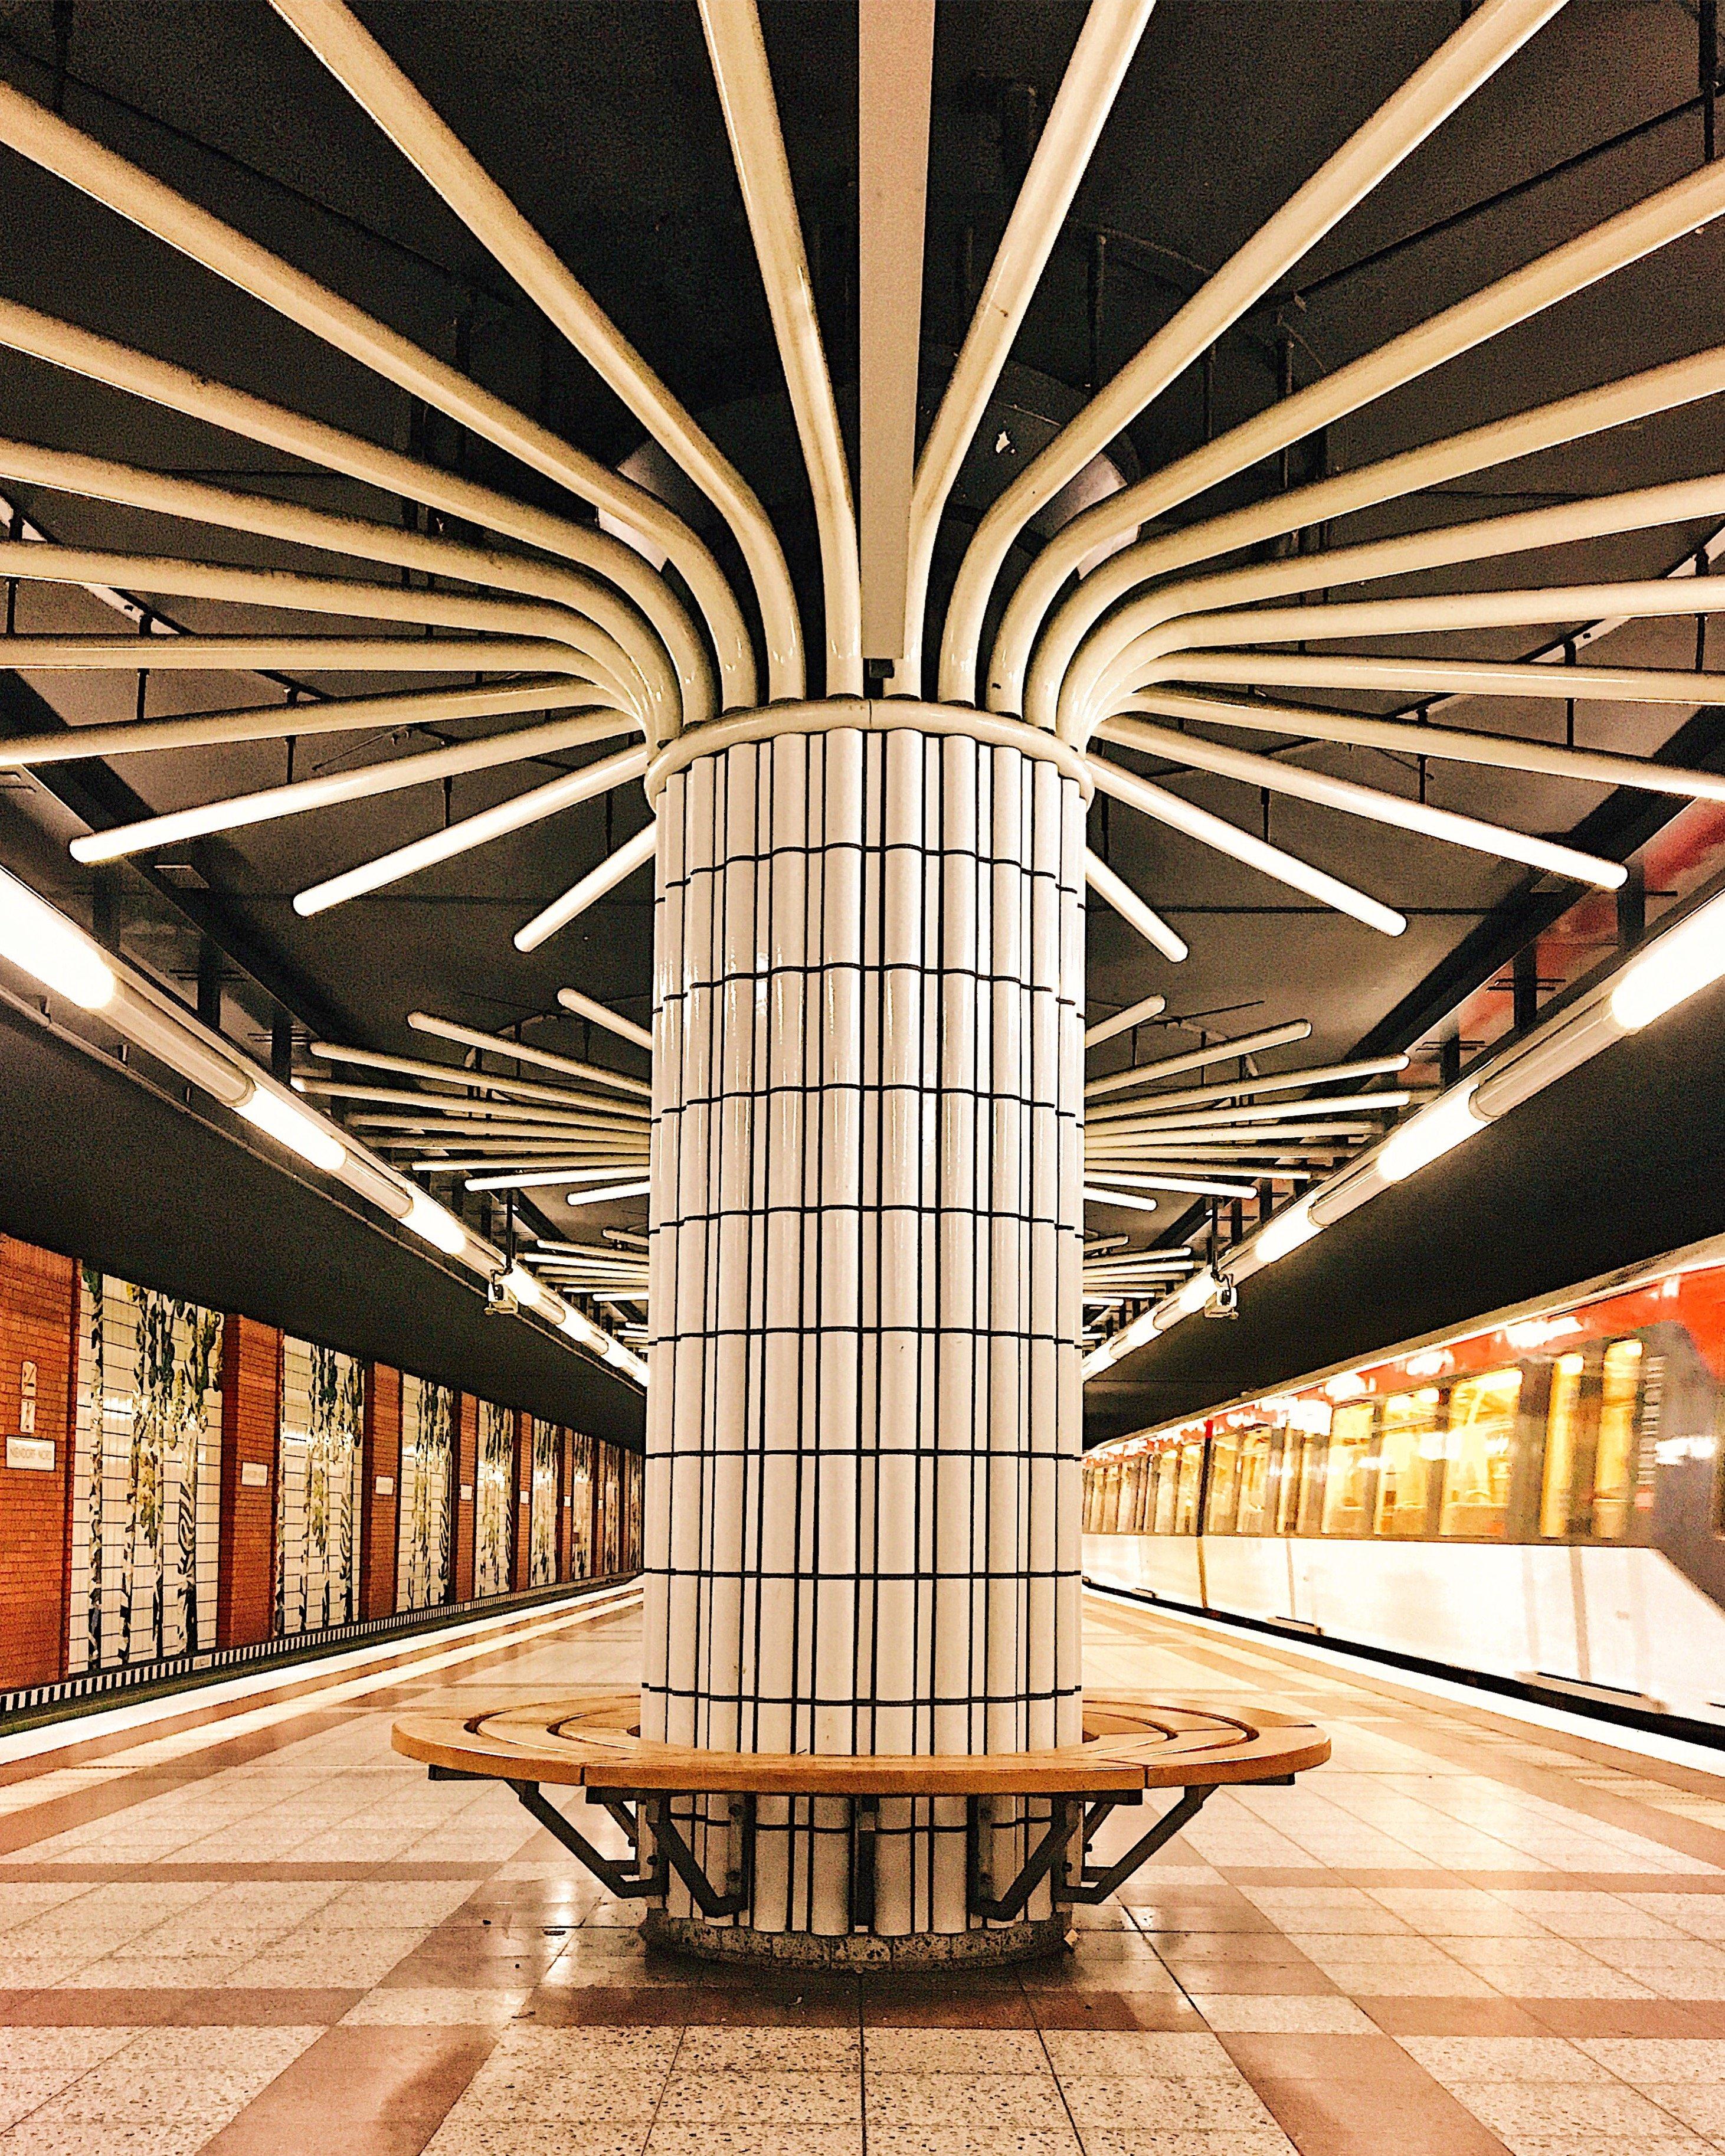 U-Bahn Niendorf Nord: Coole U-Bahn-Stationen in Hamburg